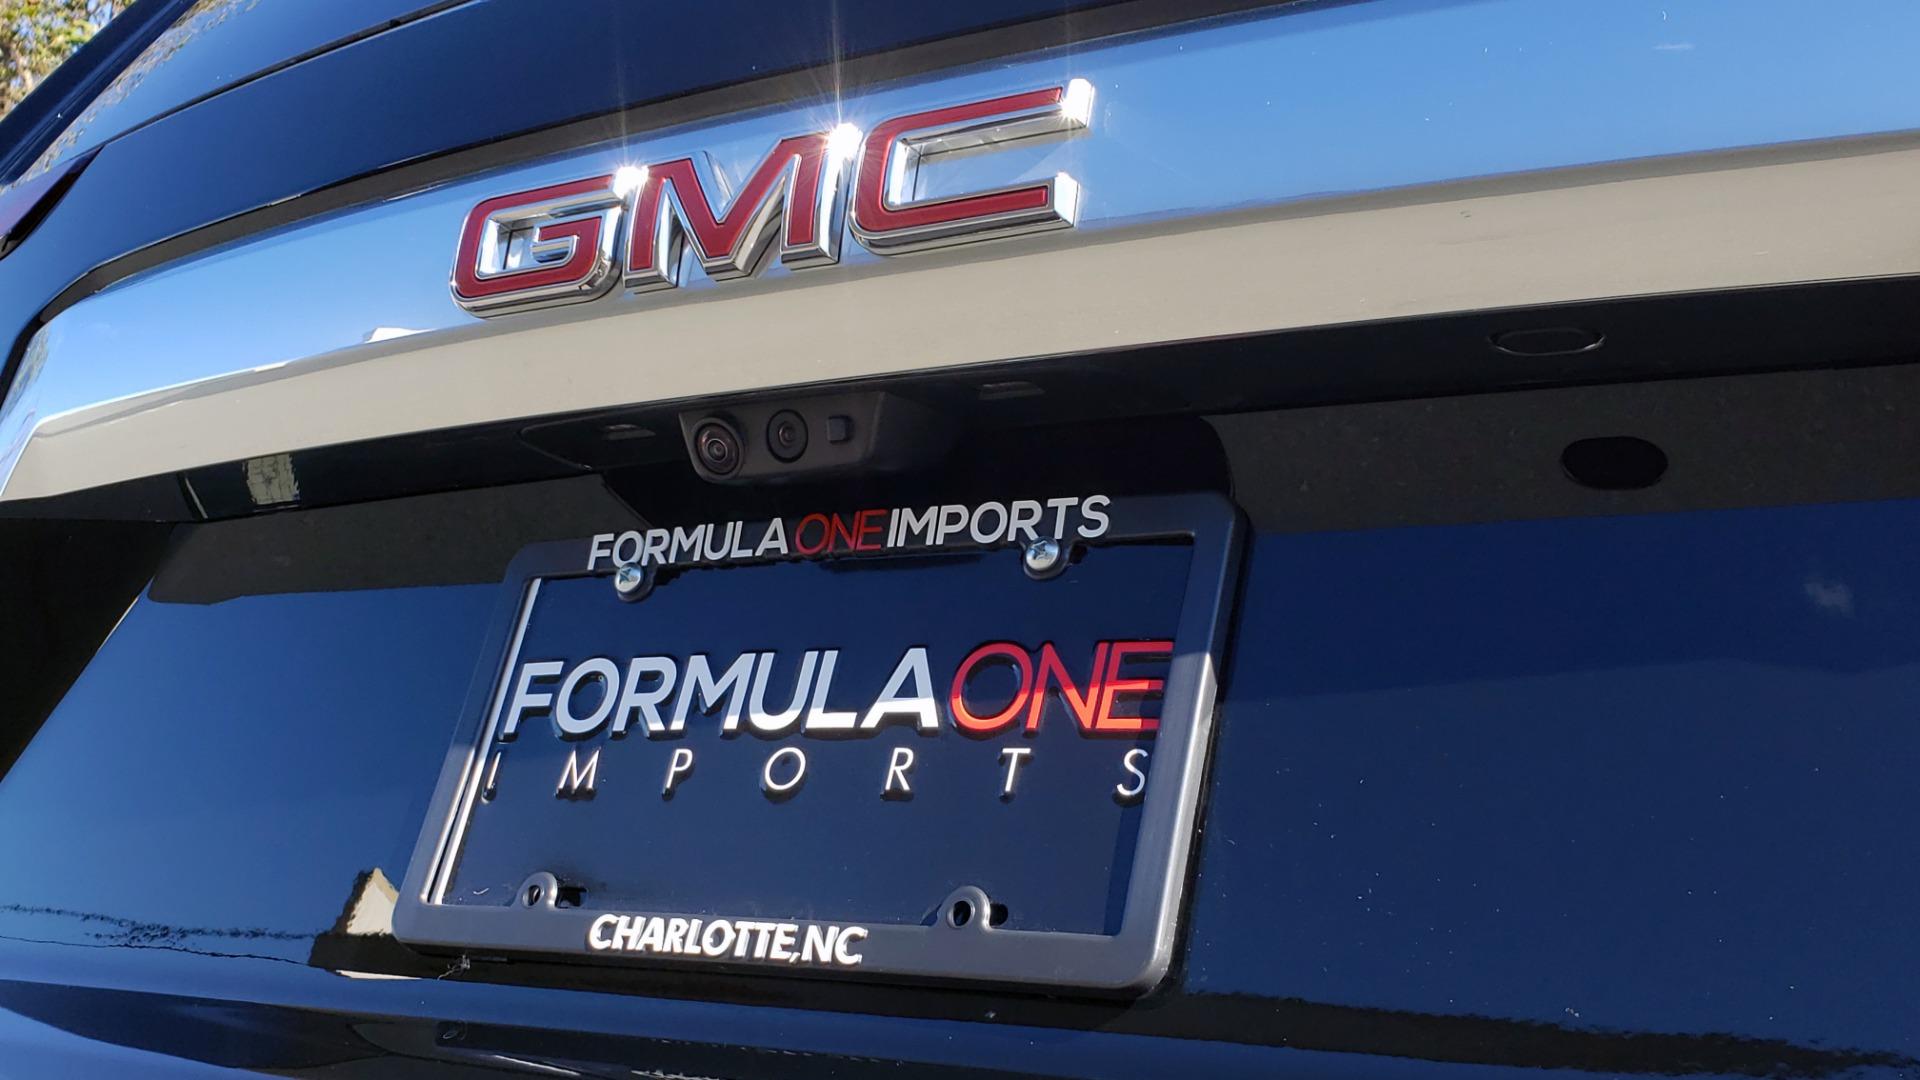 Used 2021 GMC YUKON DENALI PREMIUM 4WD / NAV / ADVANCED TECH / ENTERTAINMENT for sale Sold at Formula Imports in Charlotte NC 28227 34